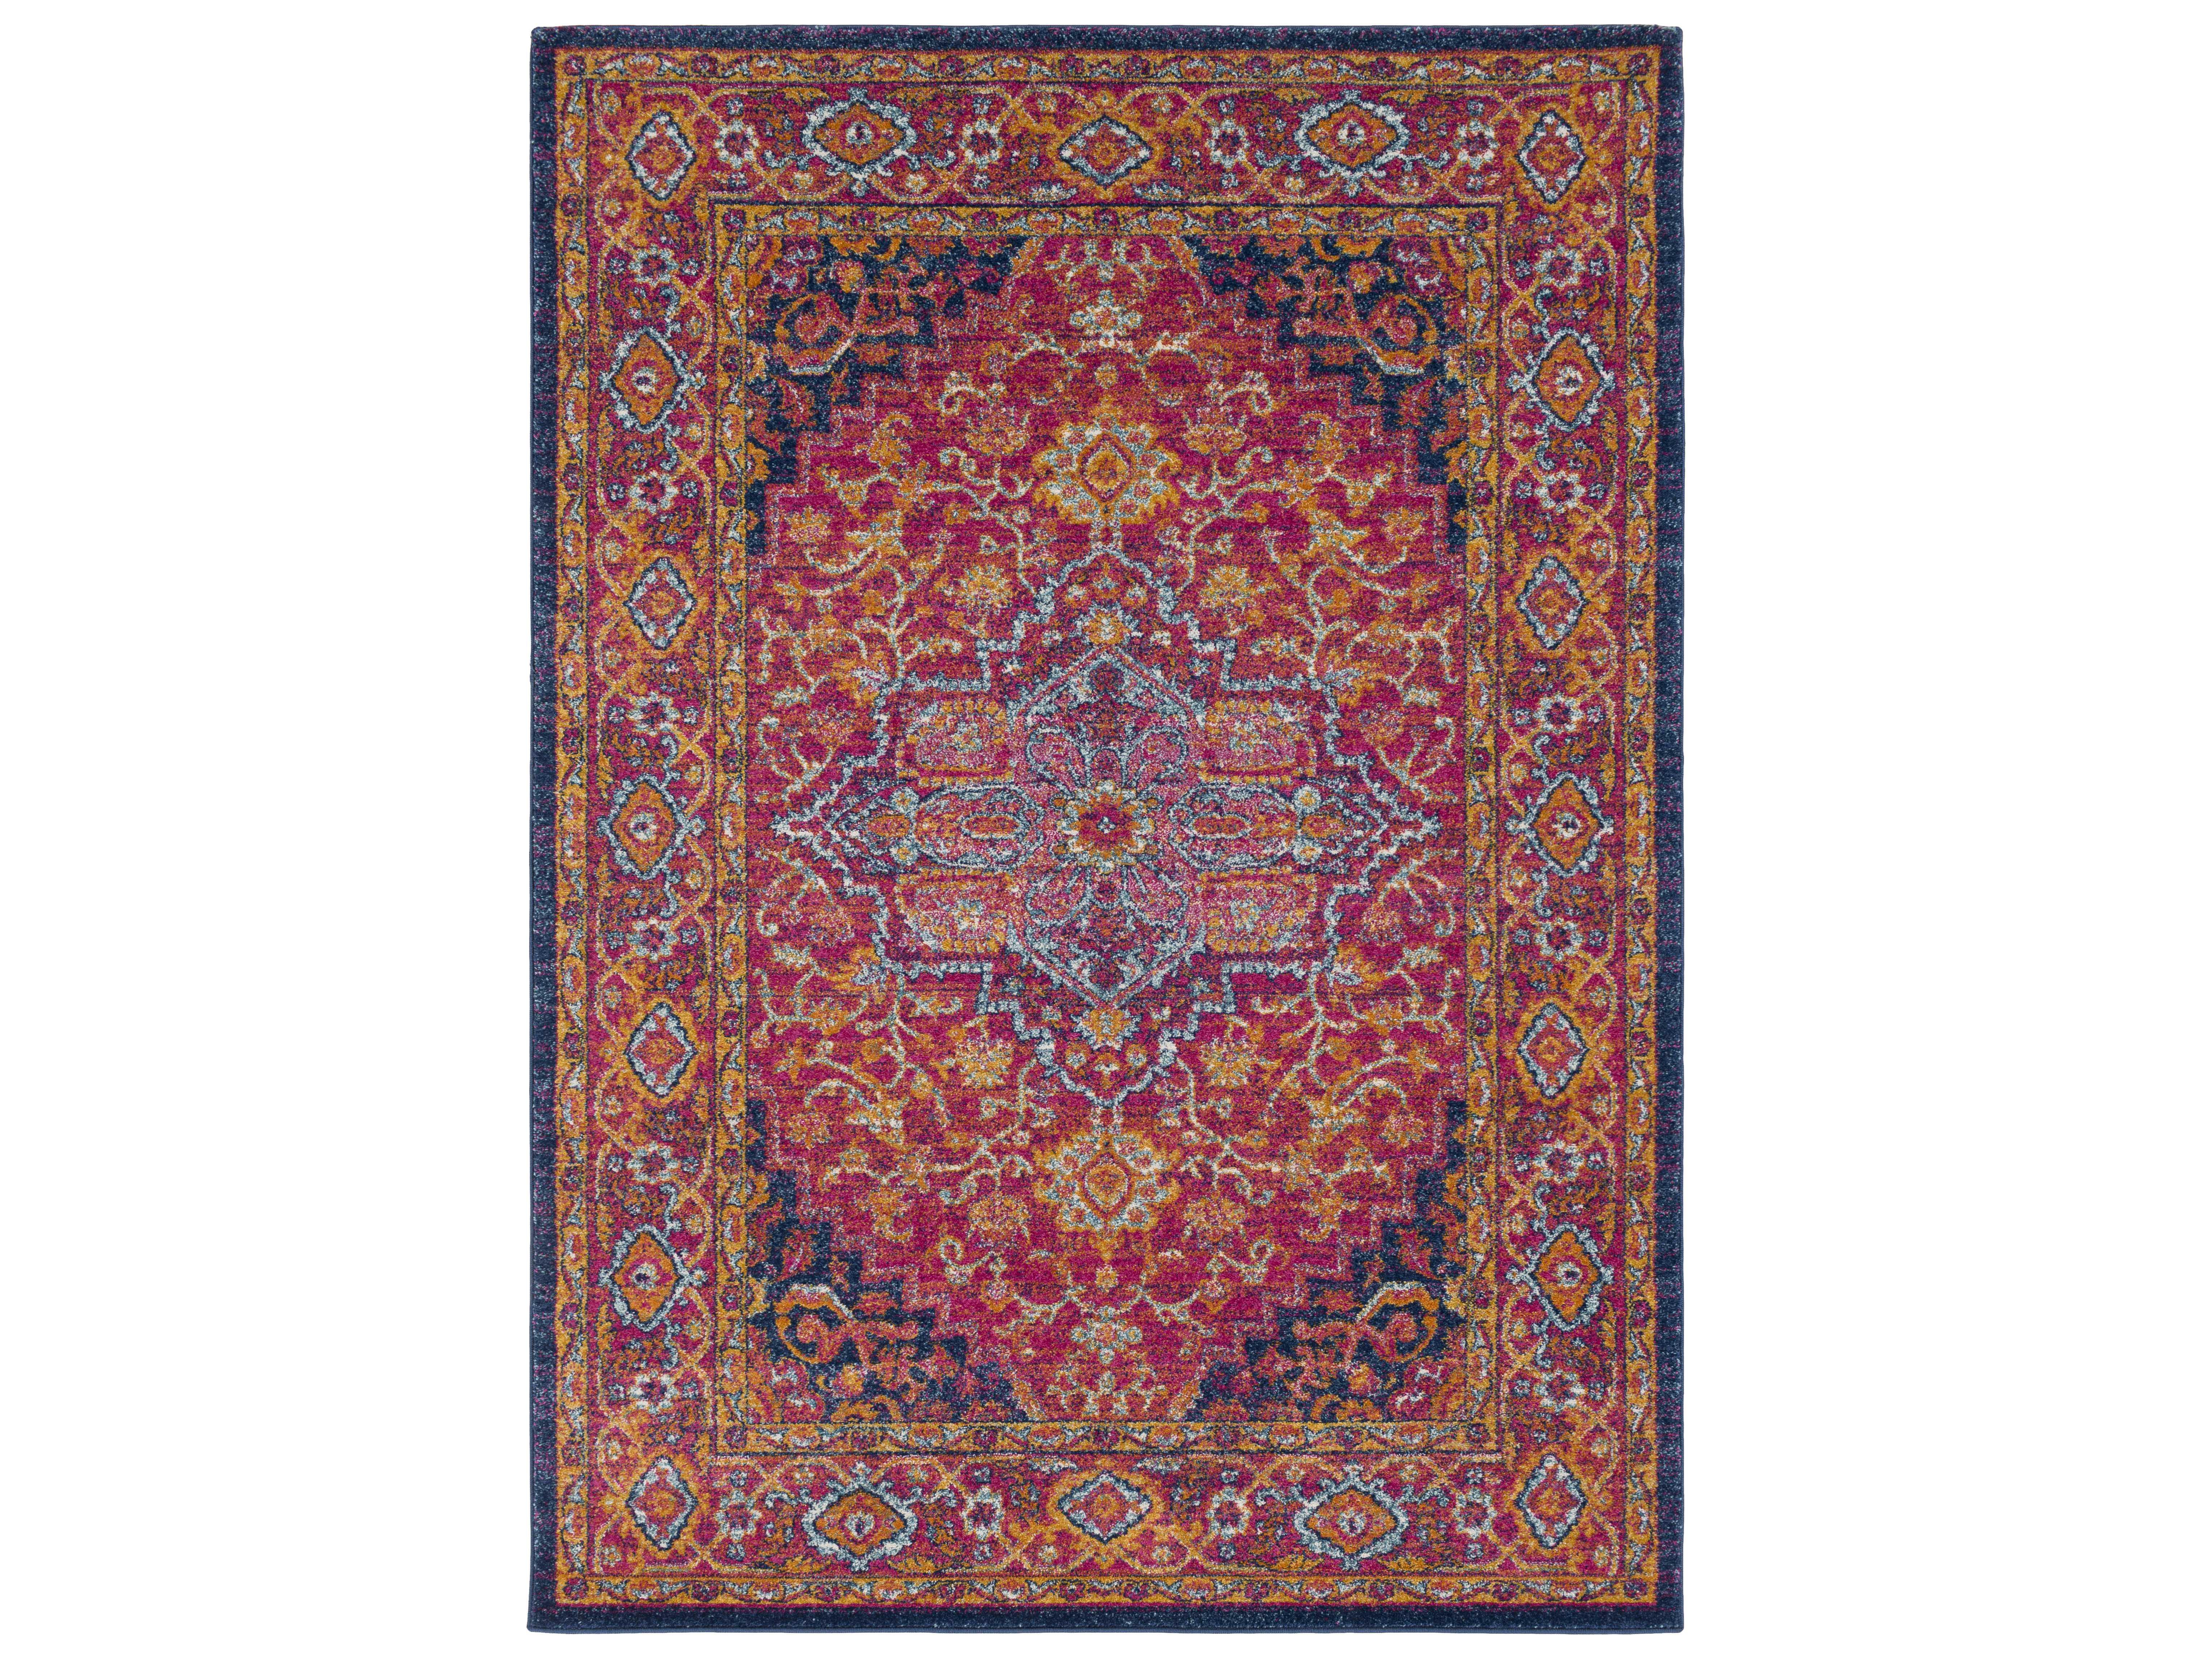 surya harput rectangular bright pink burnt orange navy area rug syhap1009rec. Black Bedroom Furniture Sets. Home Design Ideas